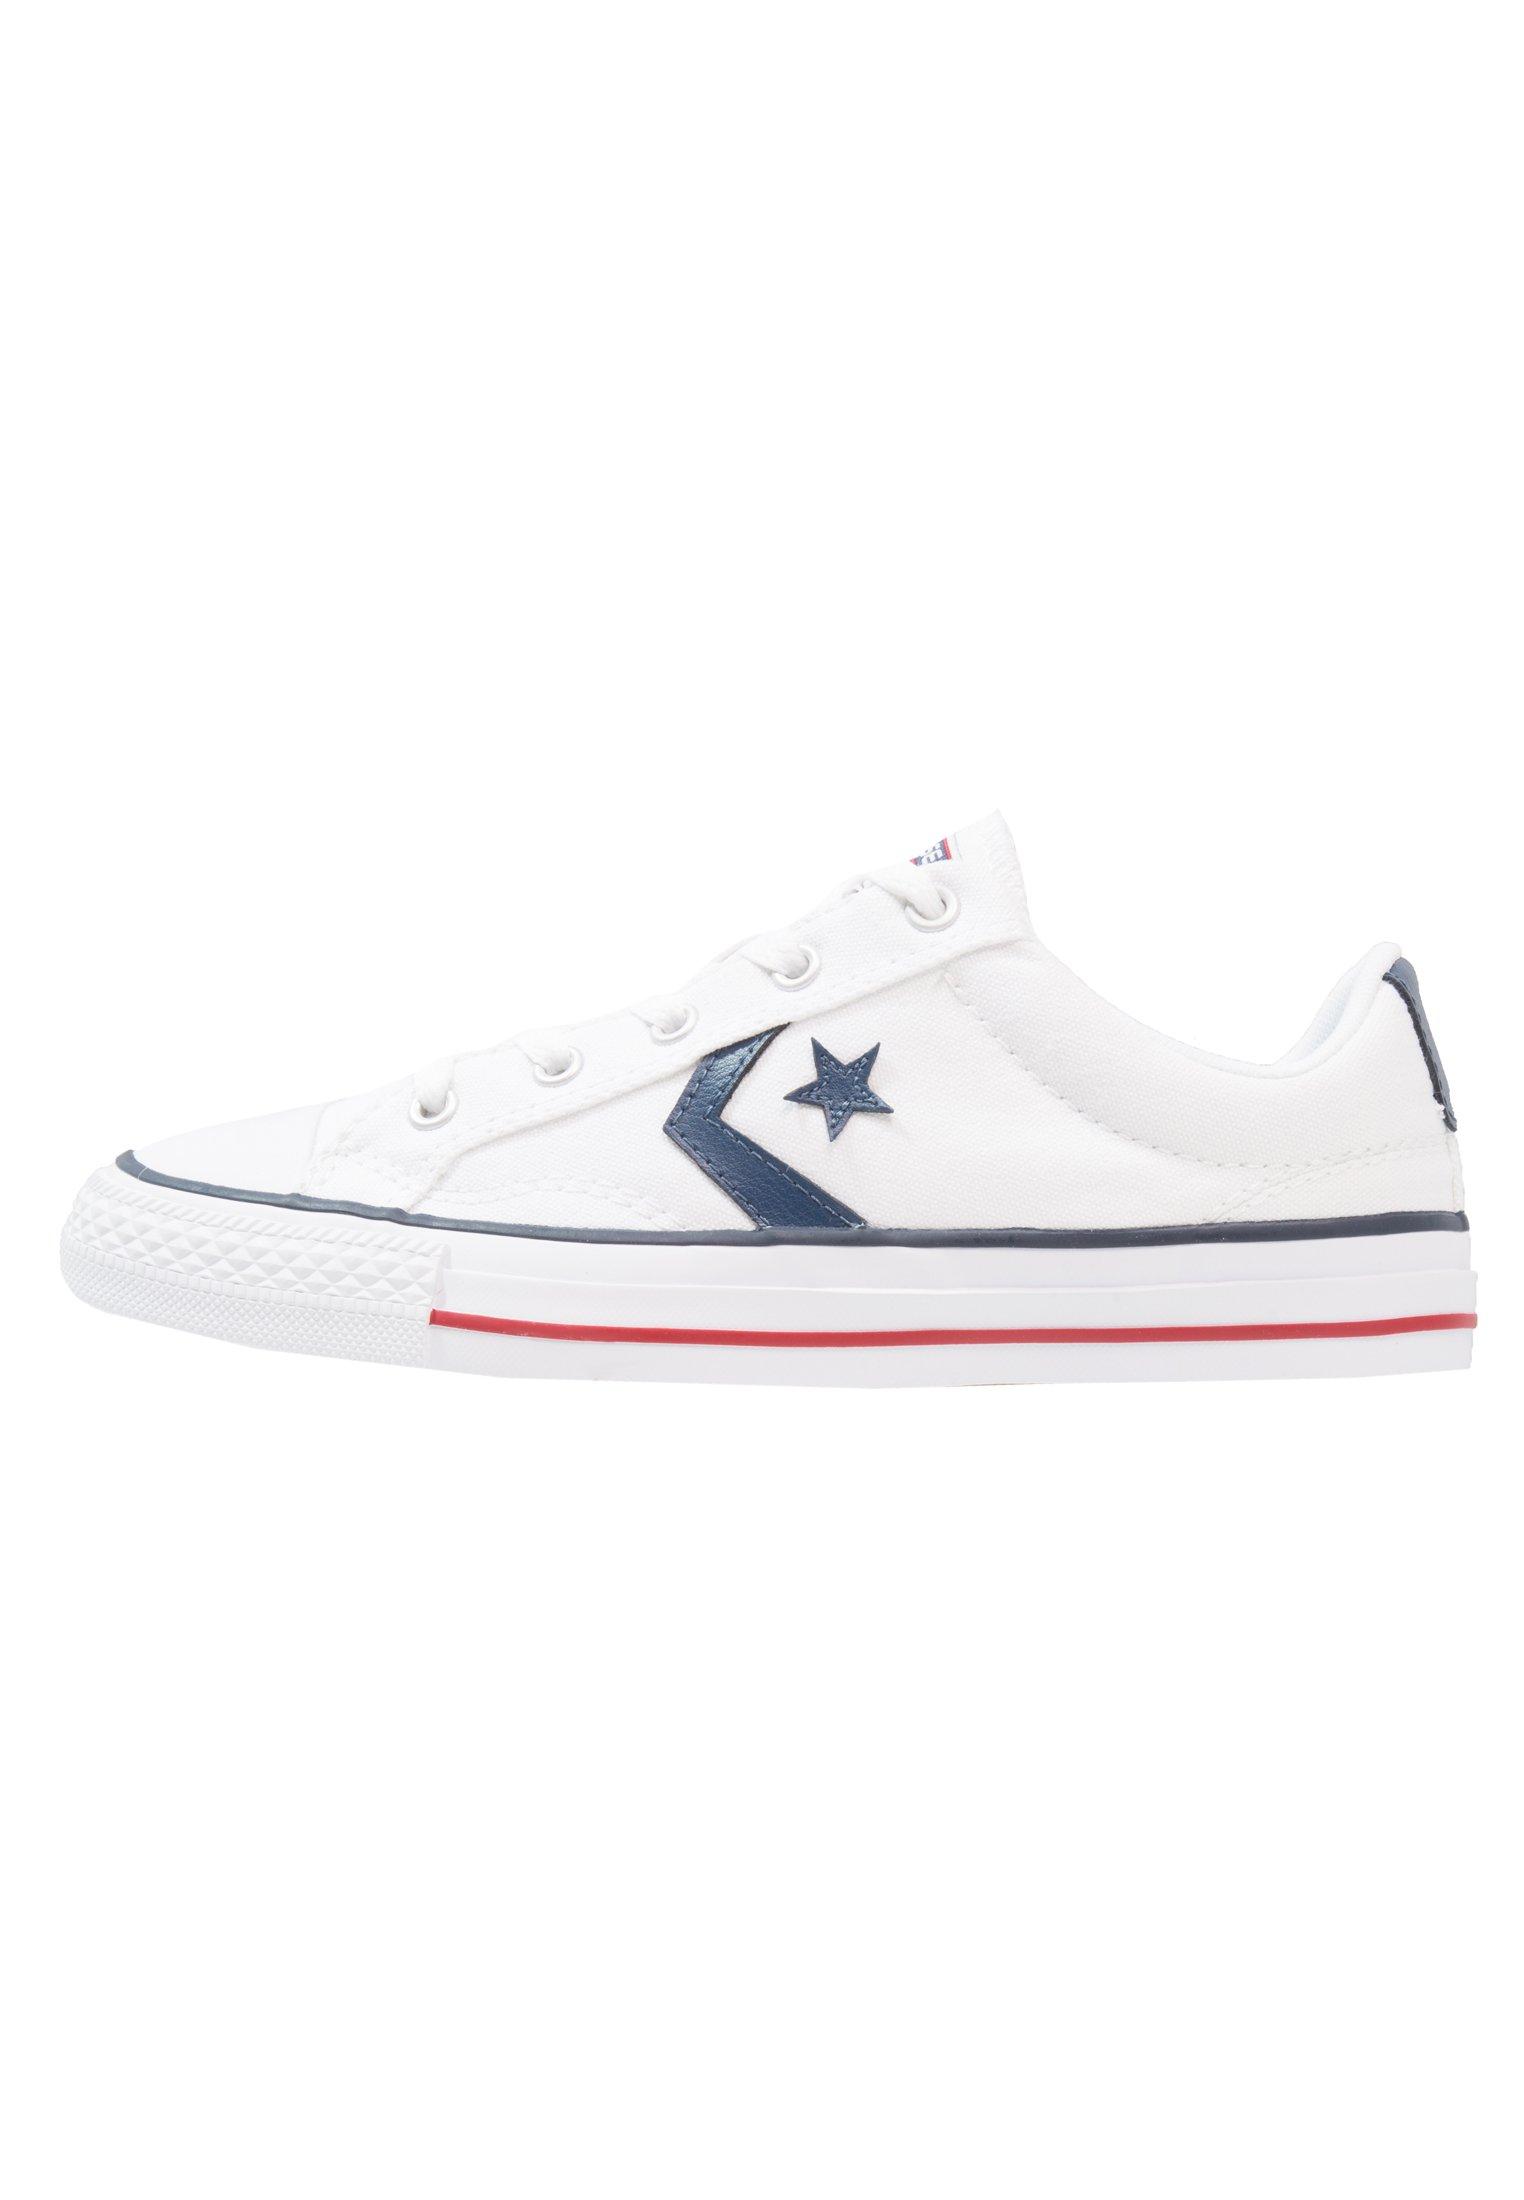 Converse STAR PLAYER OX Sneaker low whitenavy